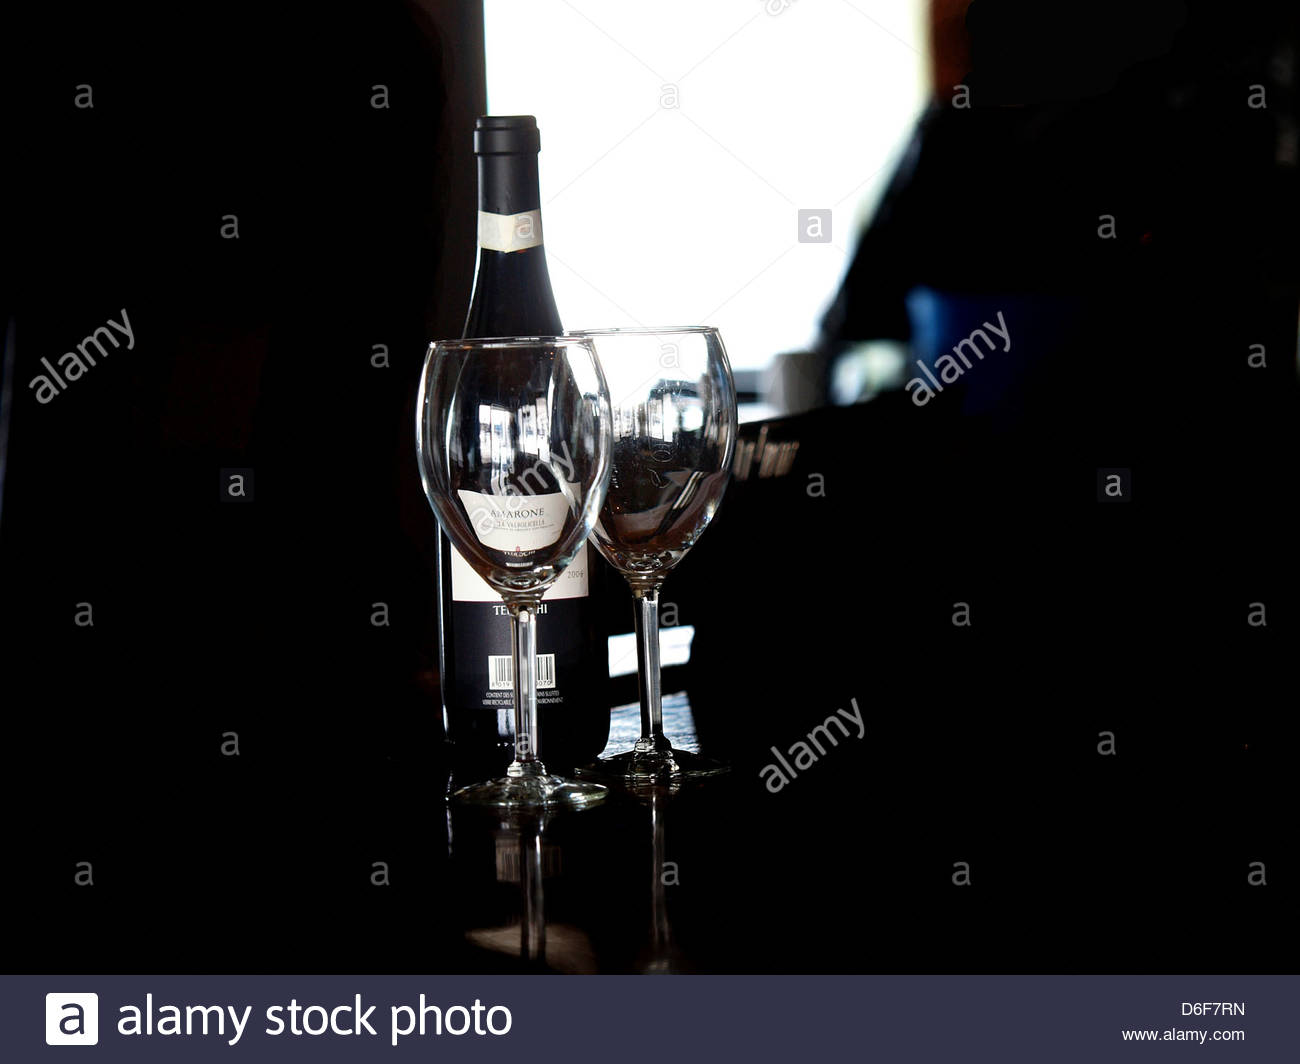 Bottle Italian red wine - Amarone - Stock Image